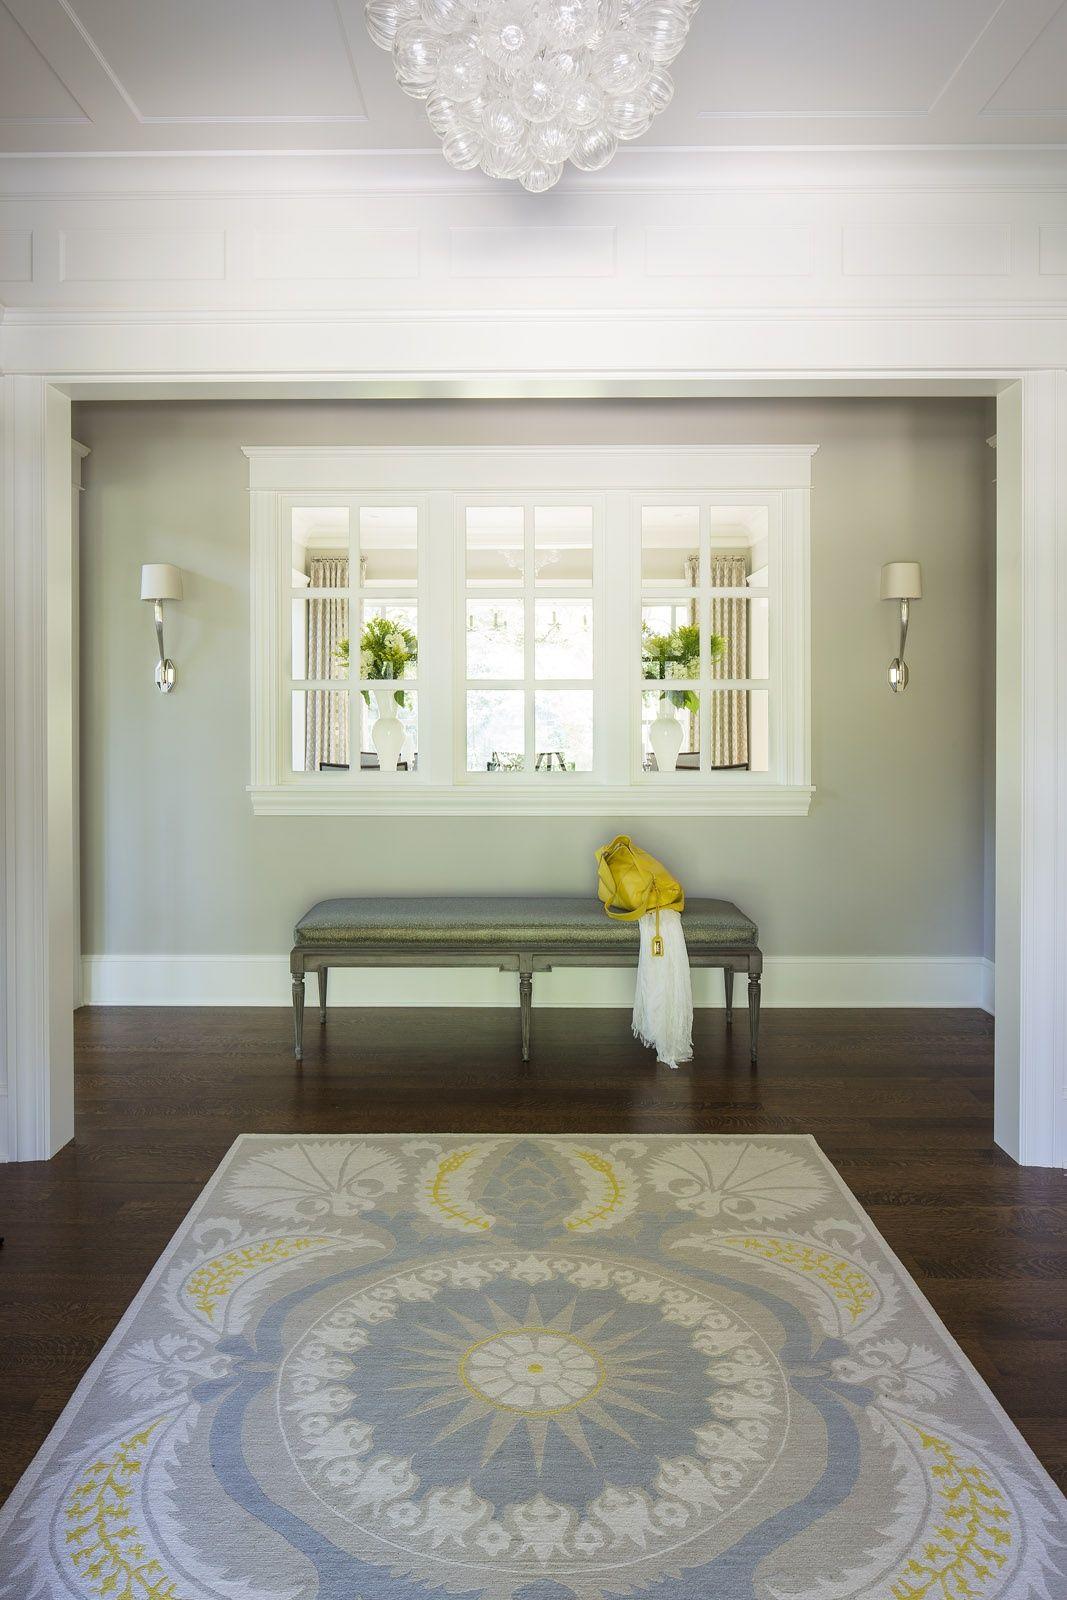 Bywood Street Residence By Martha Ohara Interiors Design Among